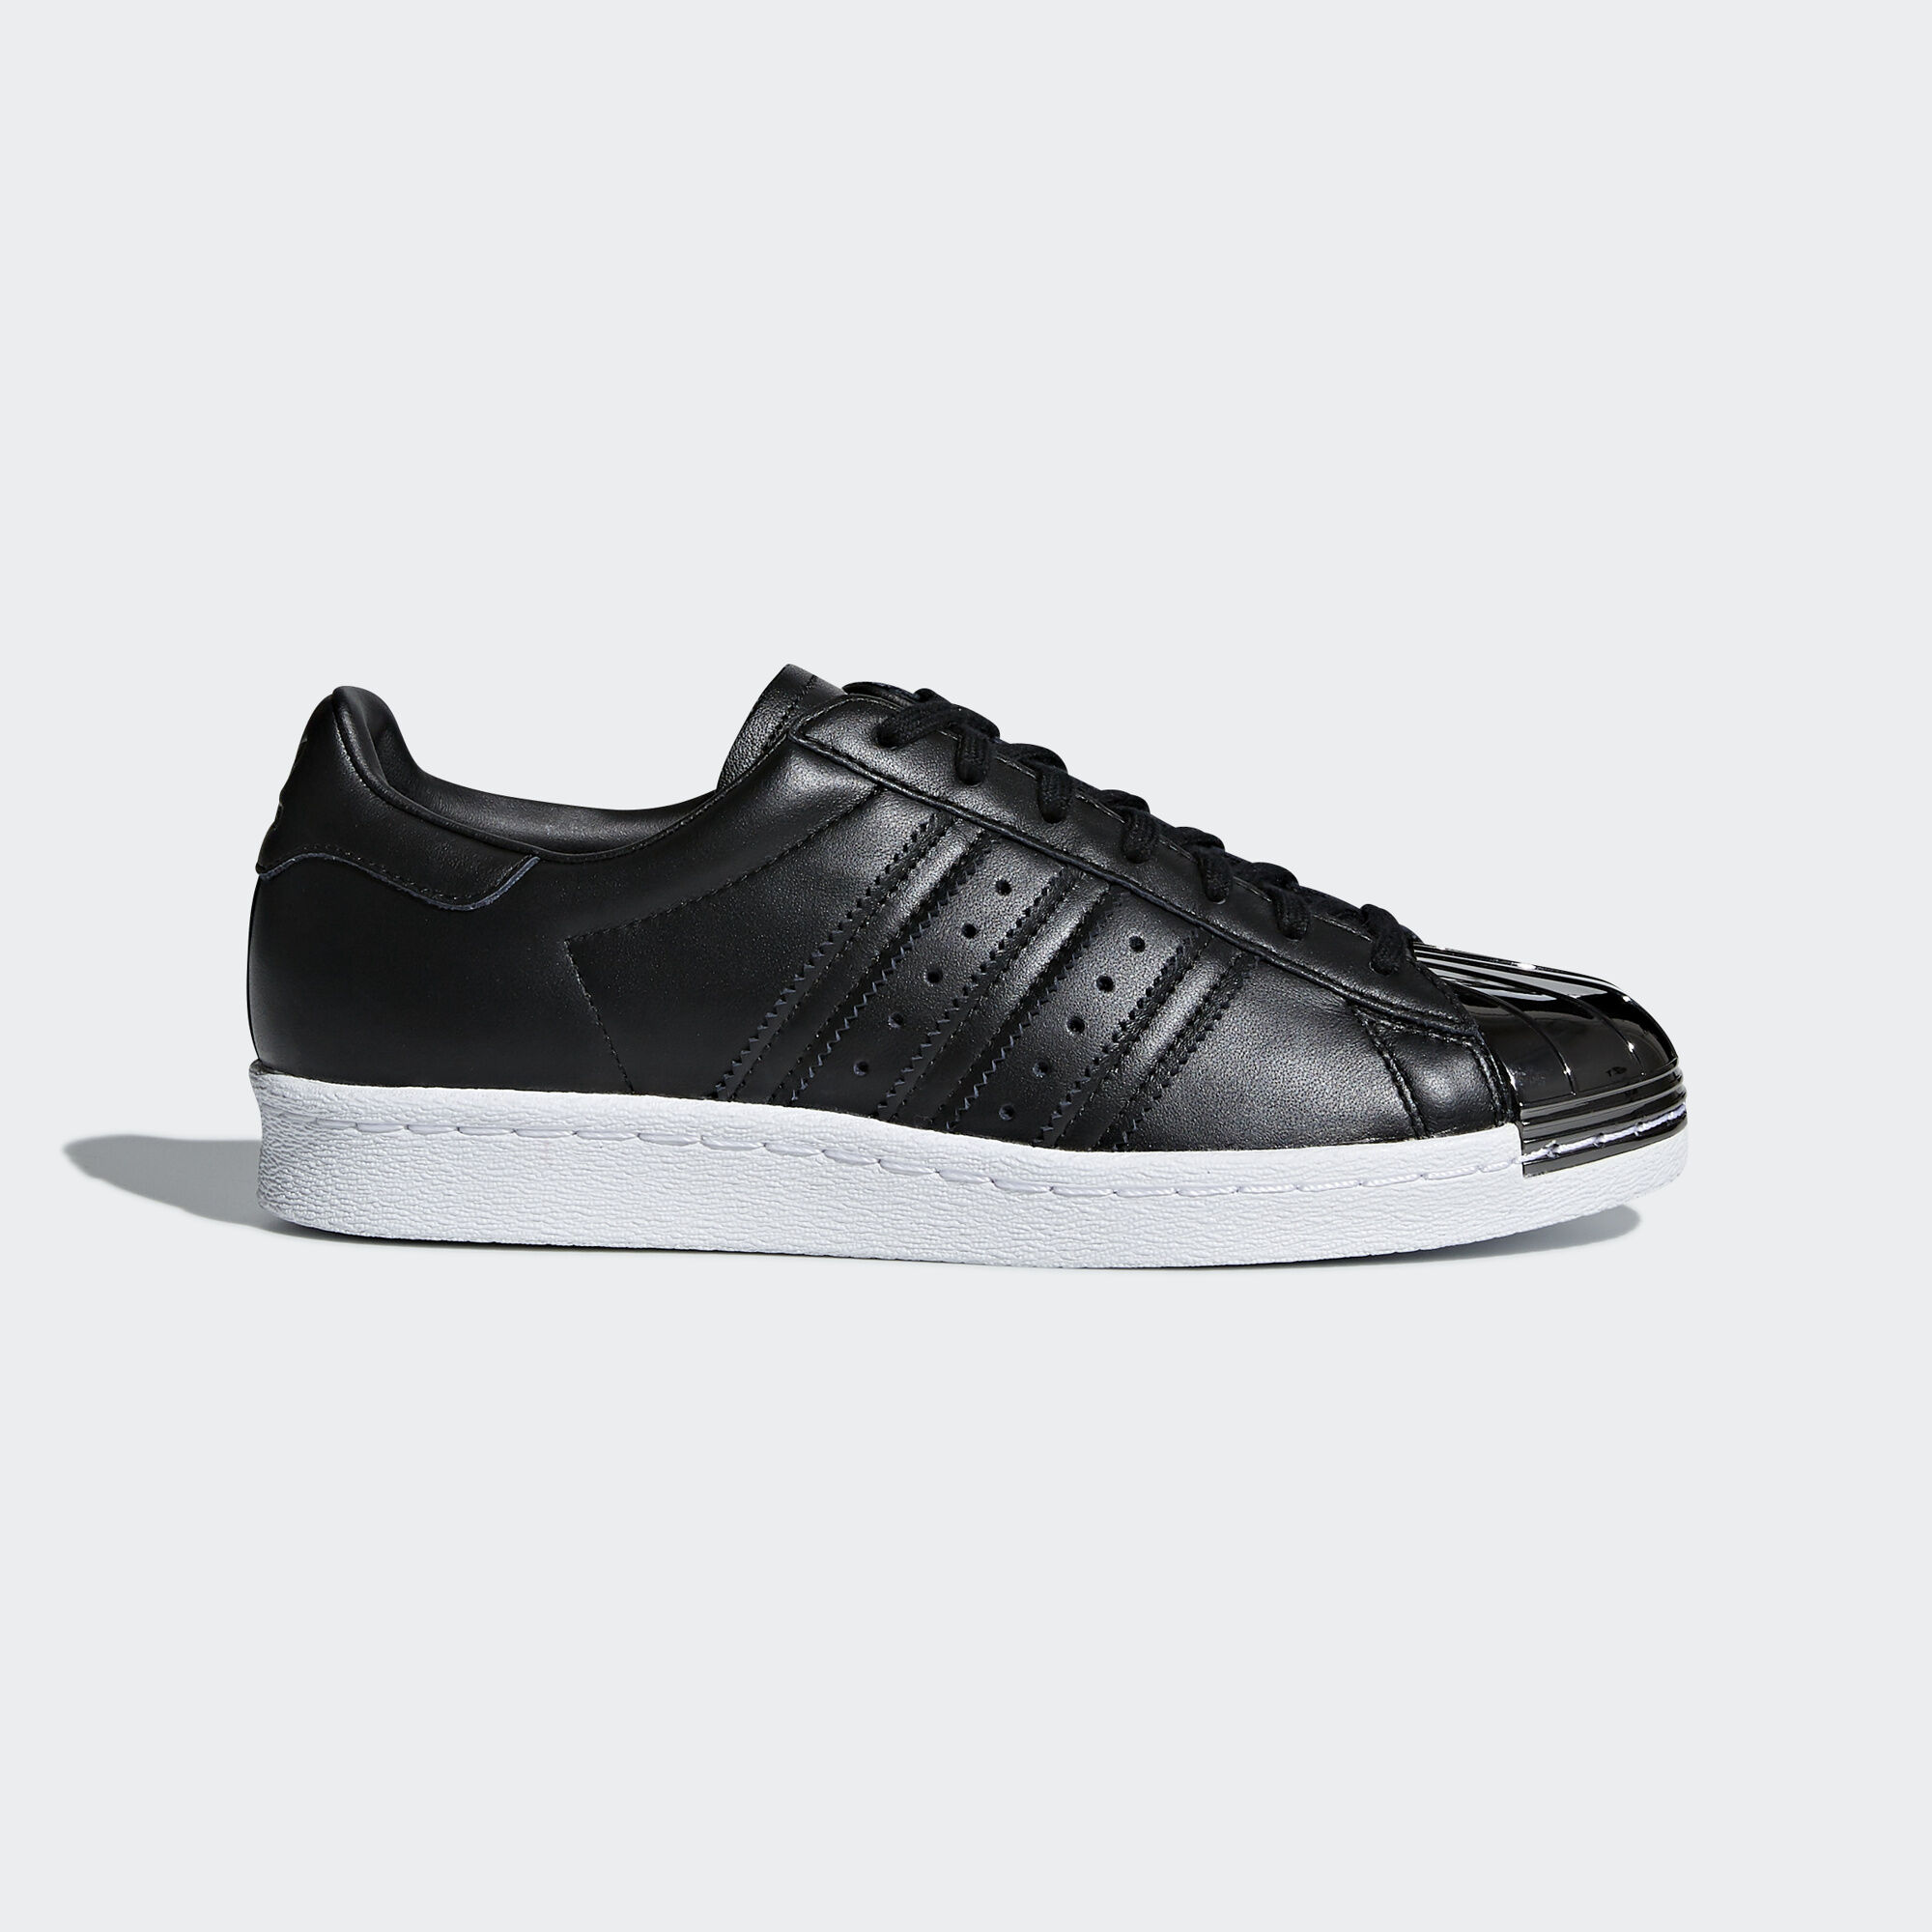 adidas - Superstar 80s Shoes Core Black/Core Black/Ftwr White DB2152